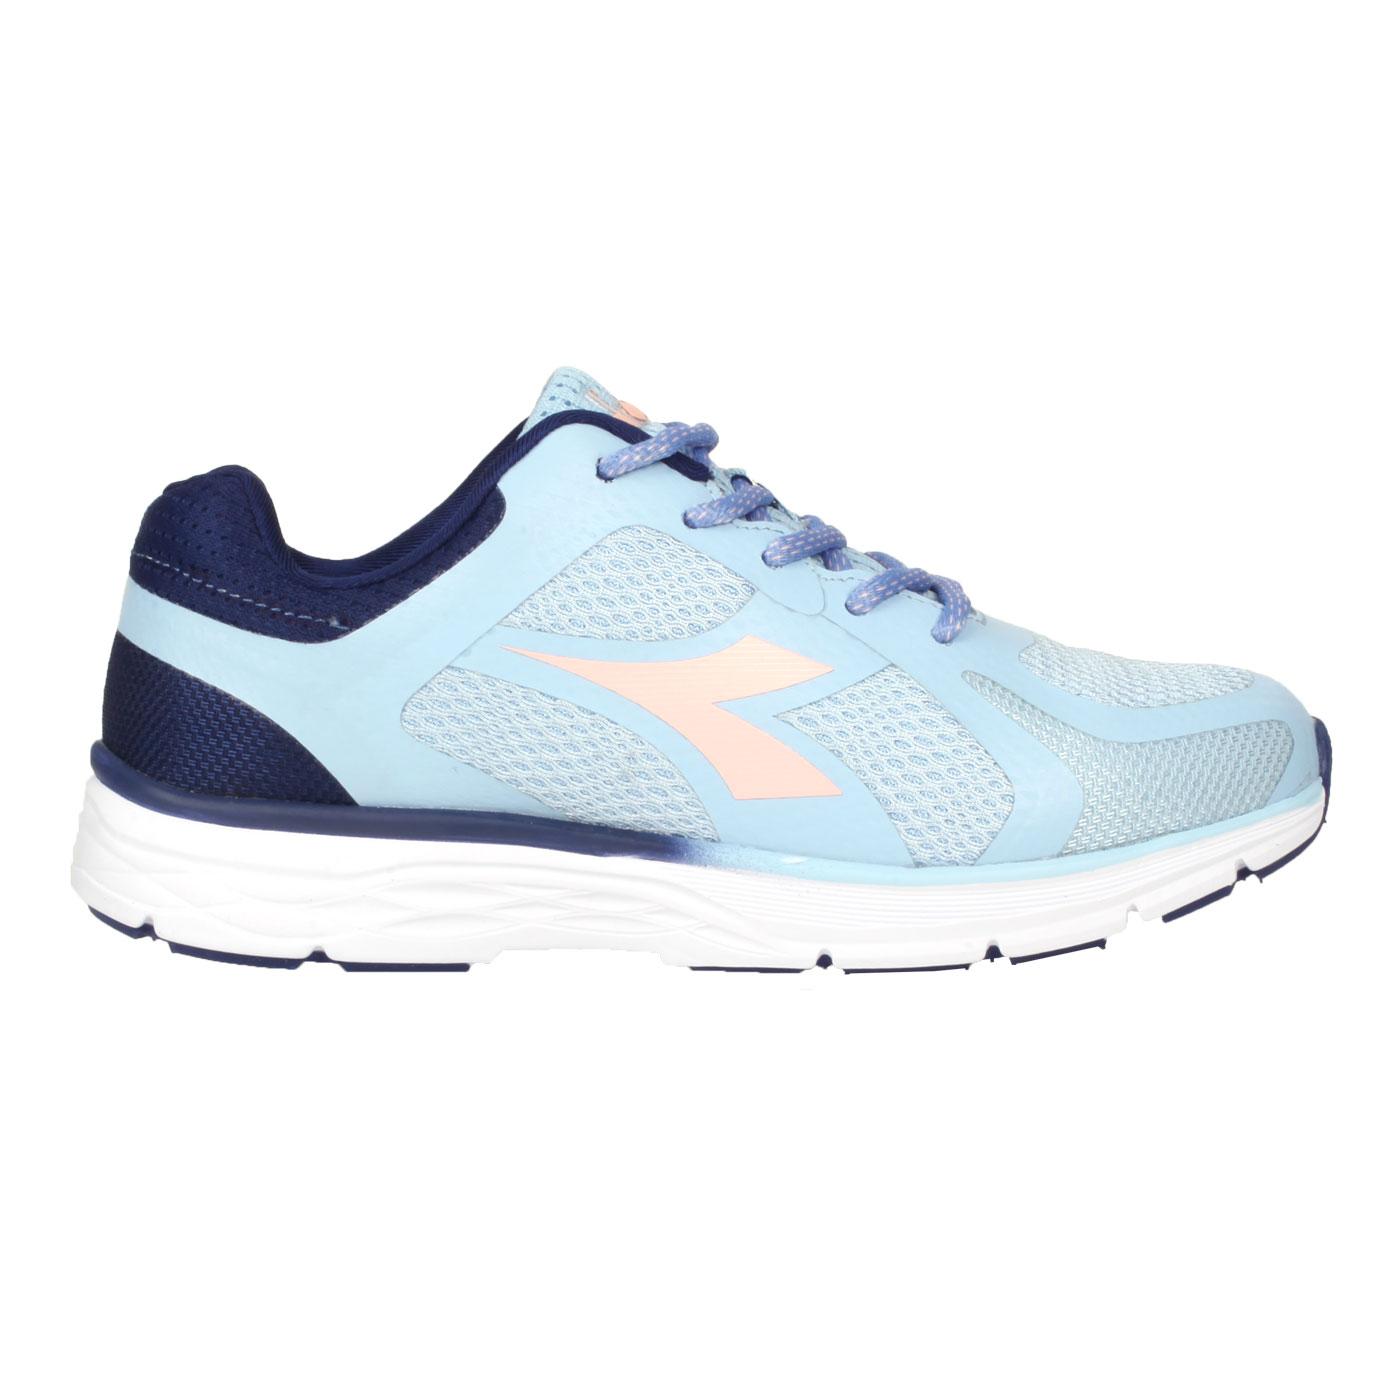 DIADORA 女款輕量慢跑鞋-寬楦 DA33613 - 粉藍丈青